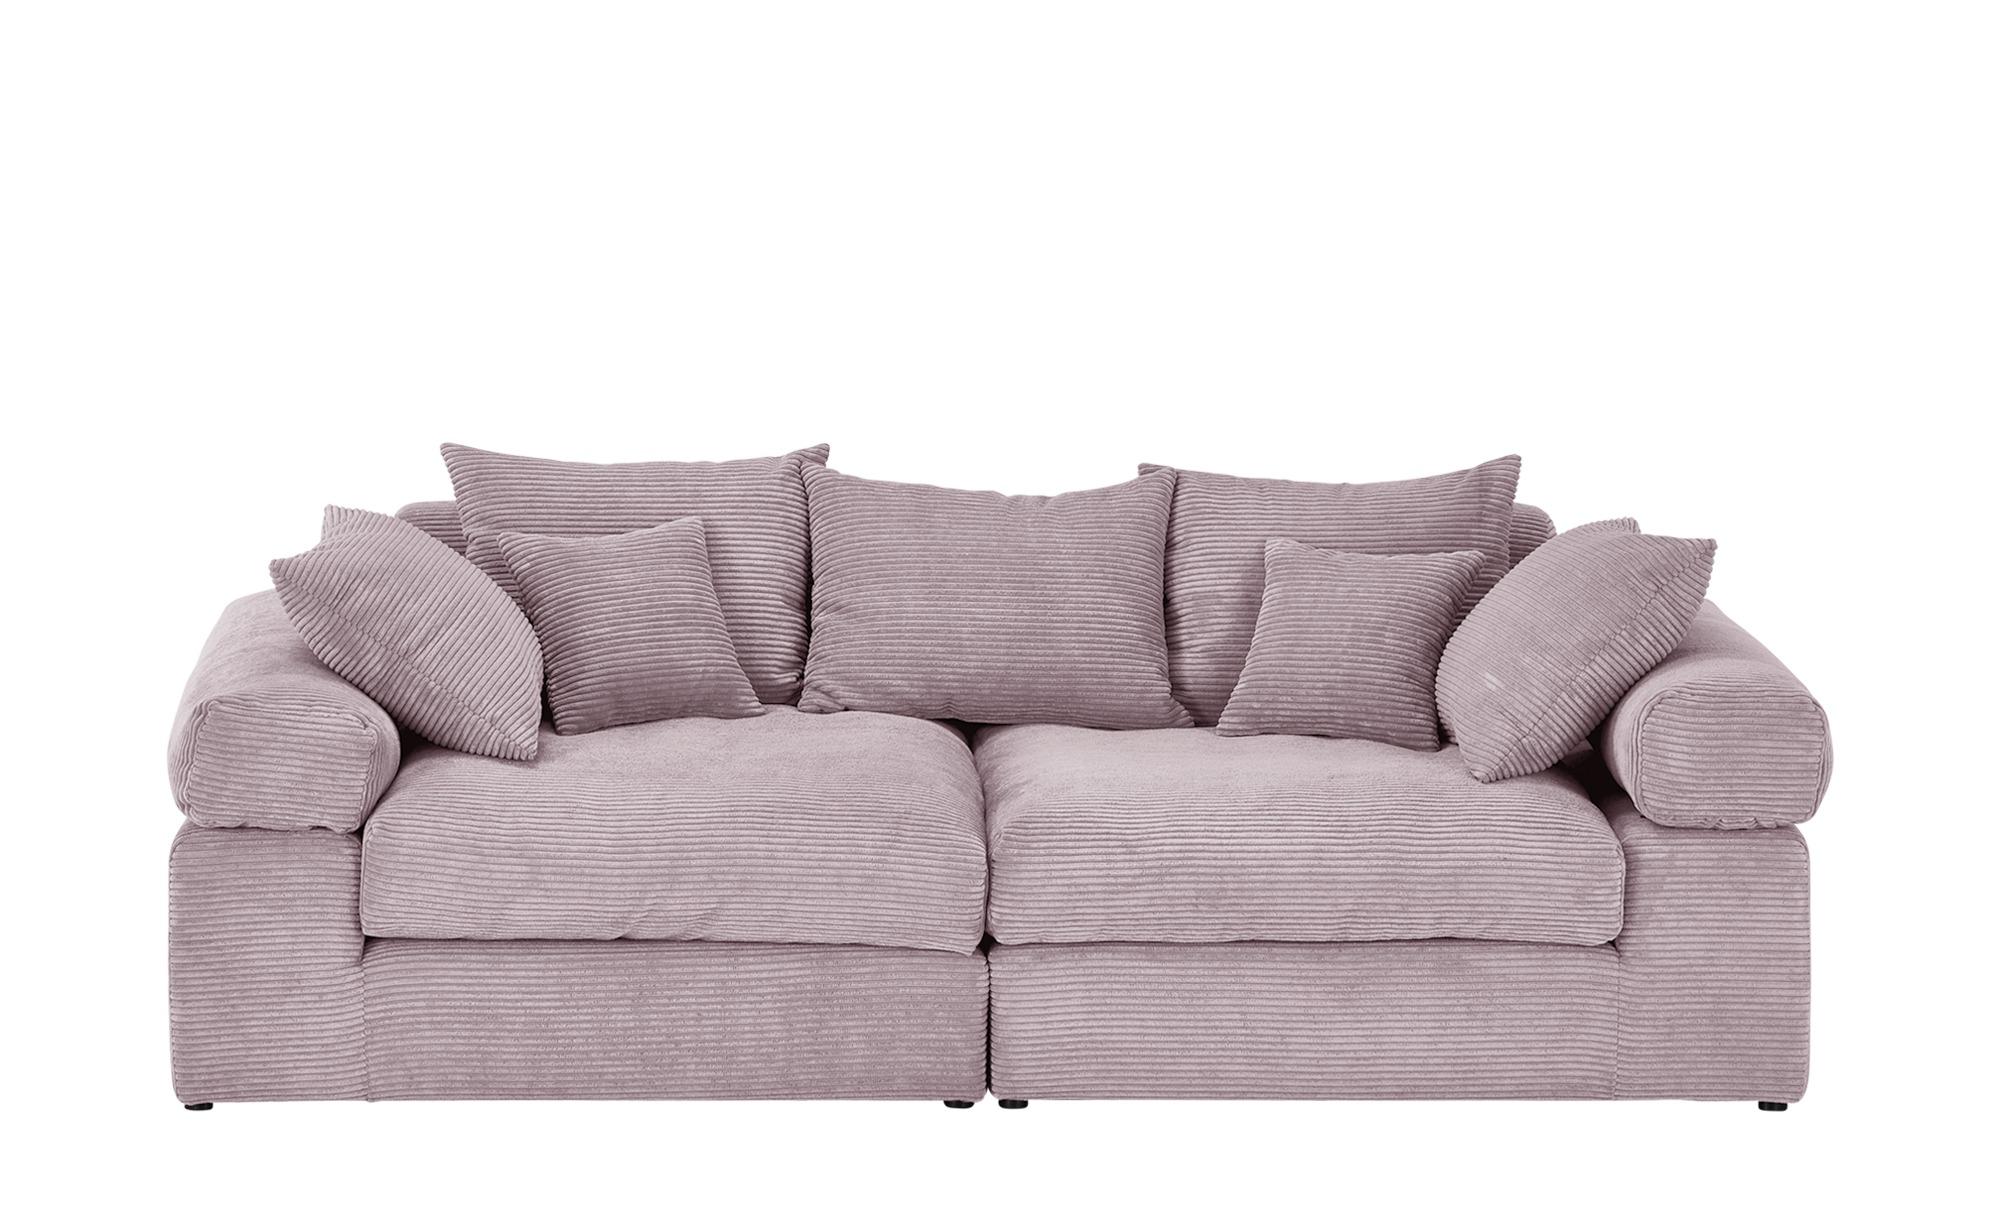 smart Big Sofa  Lionore ¦ rosa/pink ¦ Maße (cm): B: 242 H: 86 T: 121 Polstermöbel > Sofas > Big-Sofas - Höffner